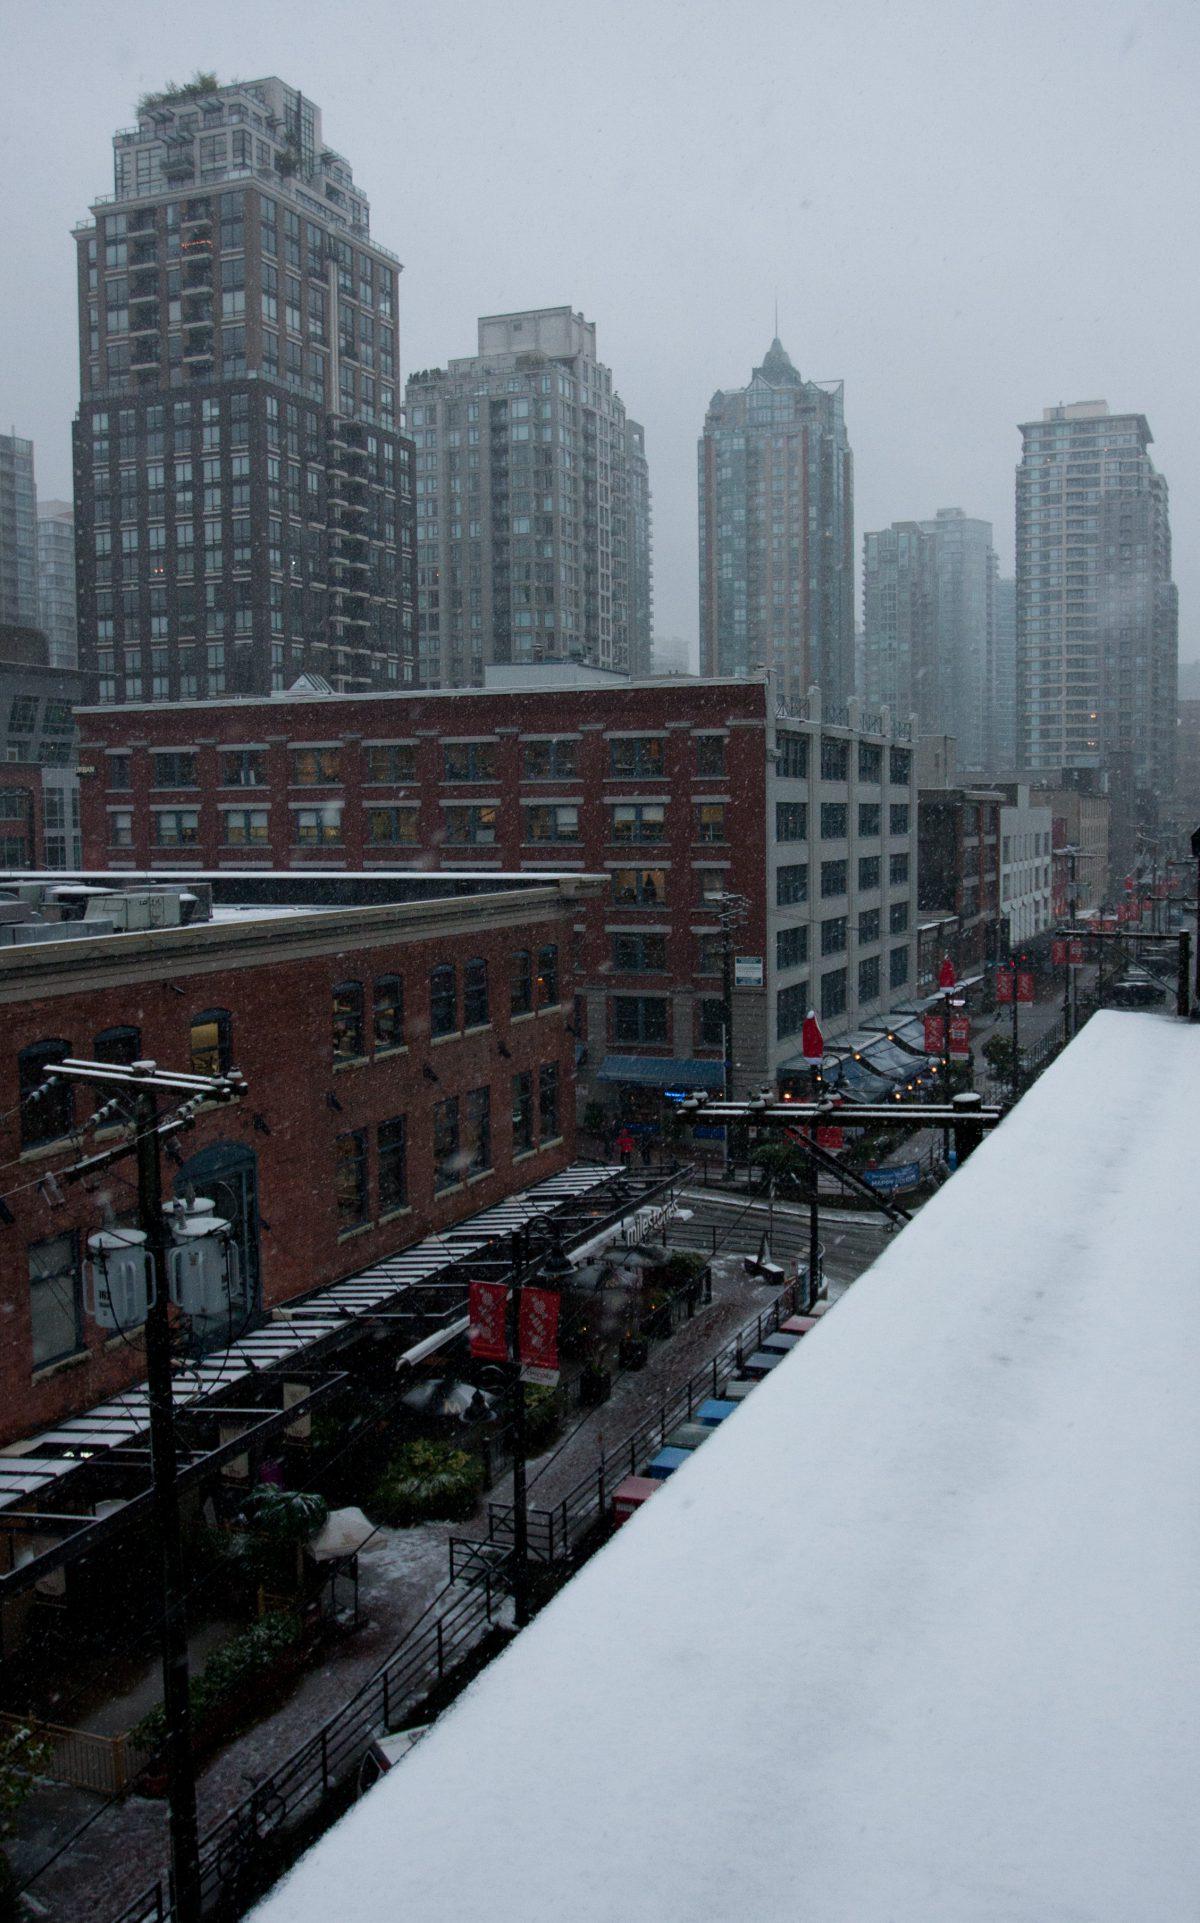 snow, city